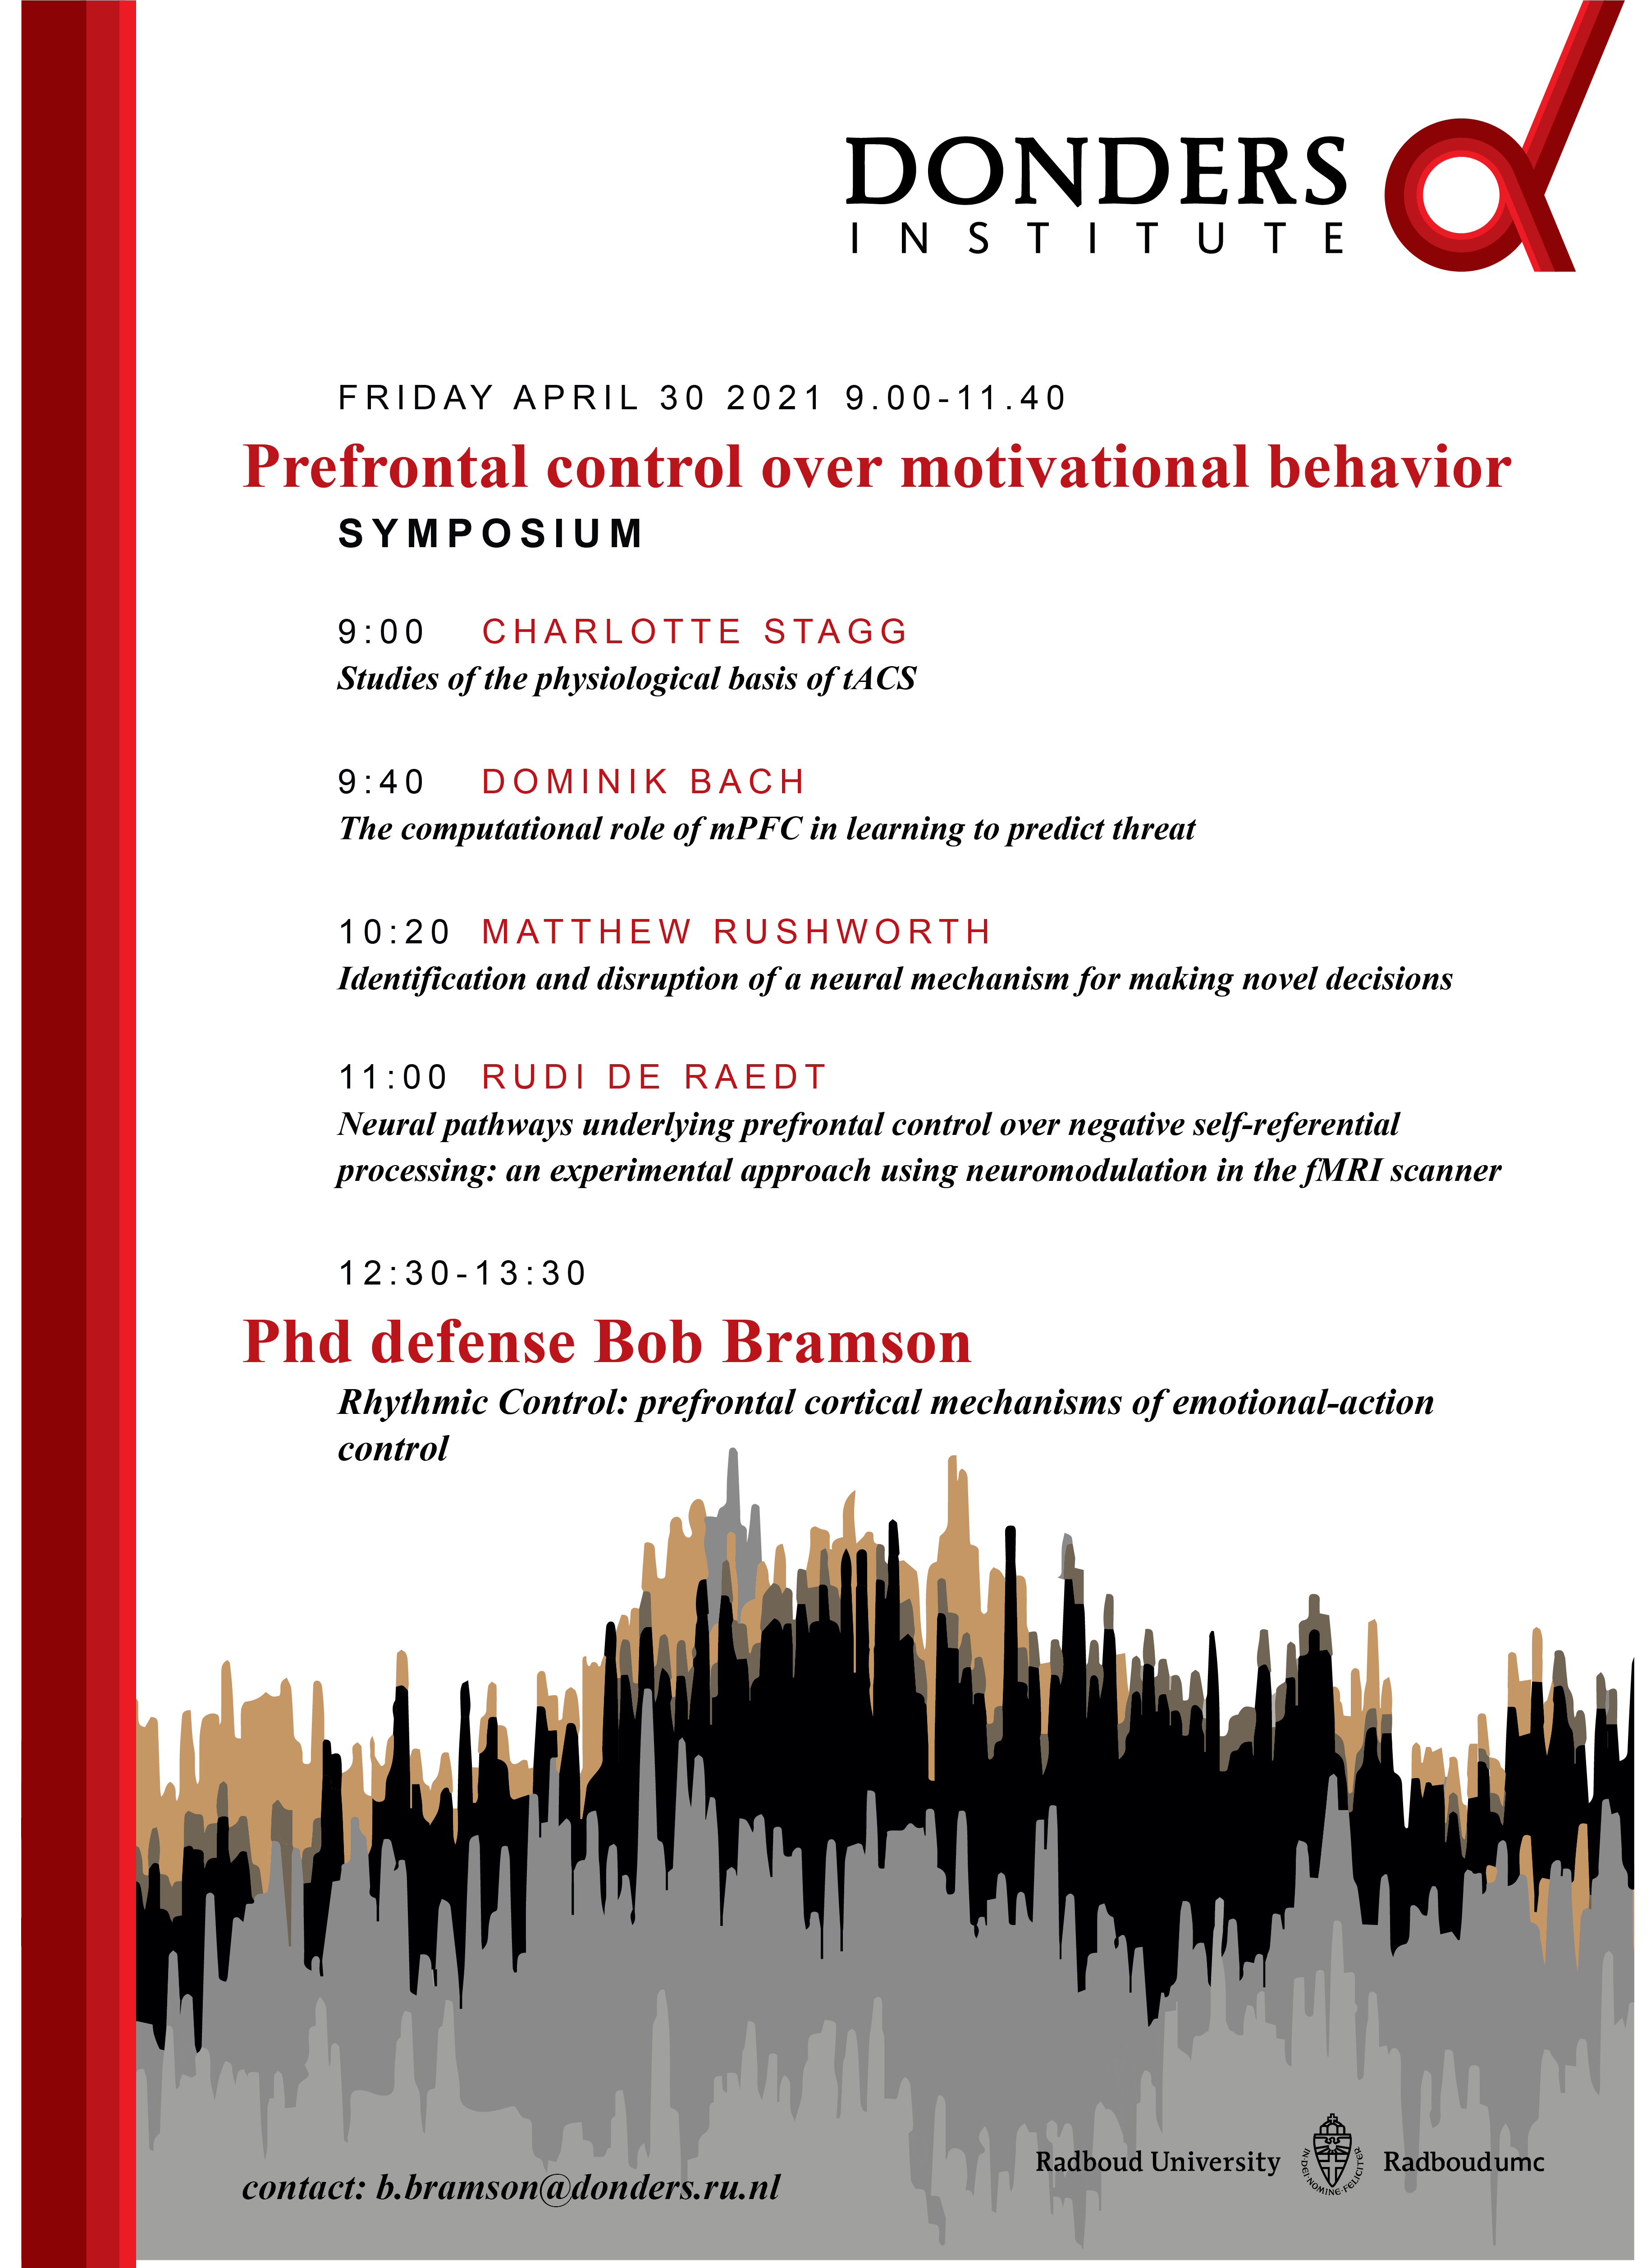 symposium_flyer